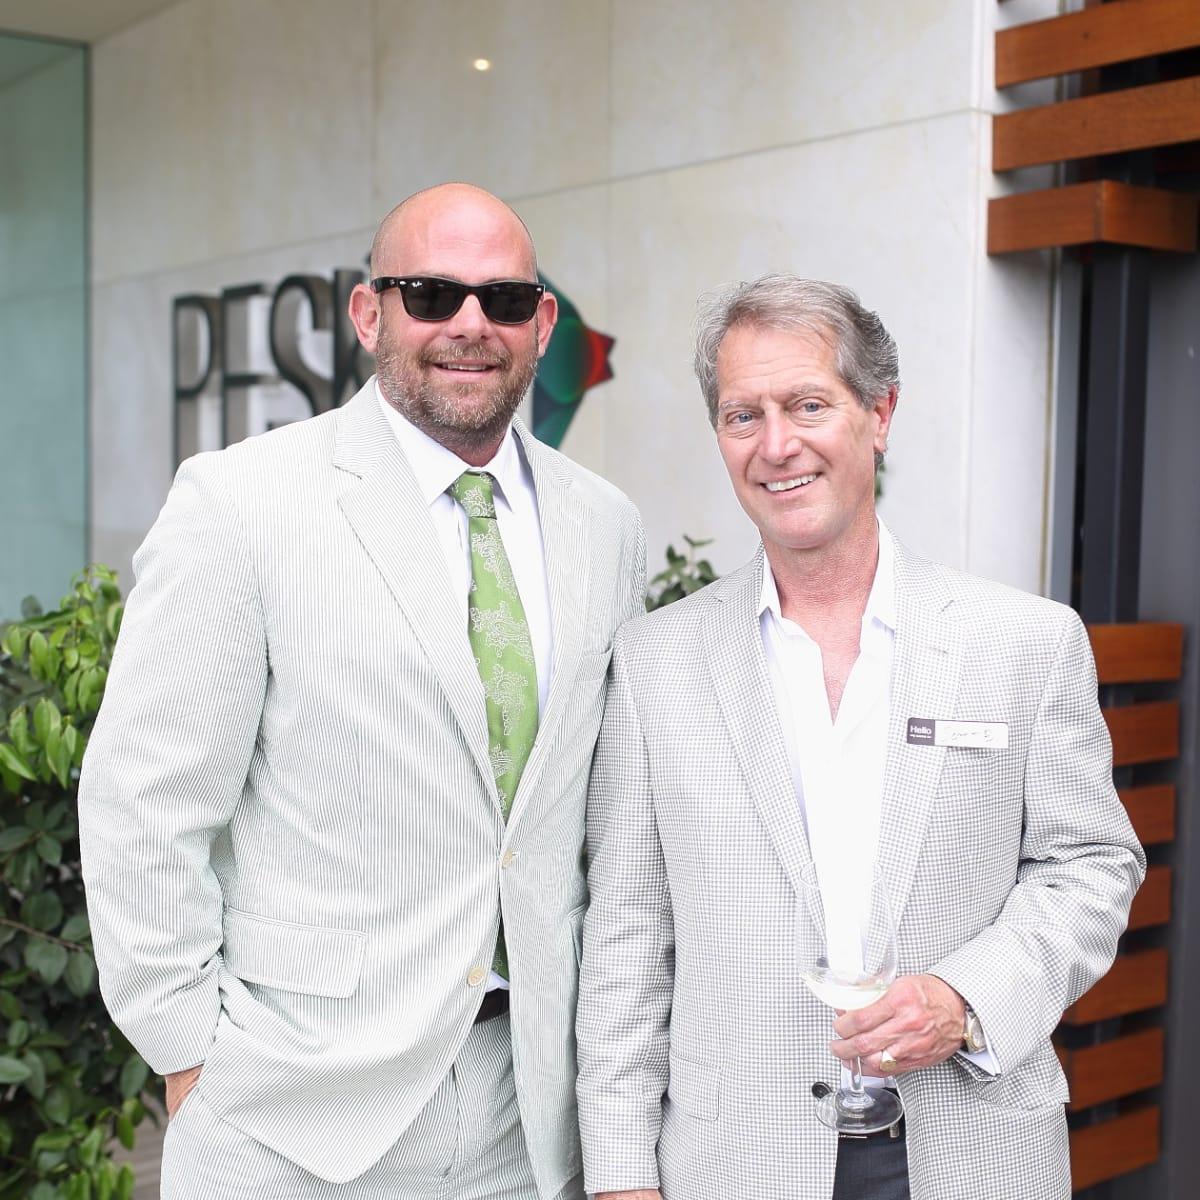 Gregg Harrison Power Lawyers, 6/16 Ralph Manginello, Scott Brann